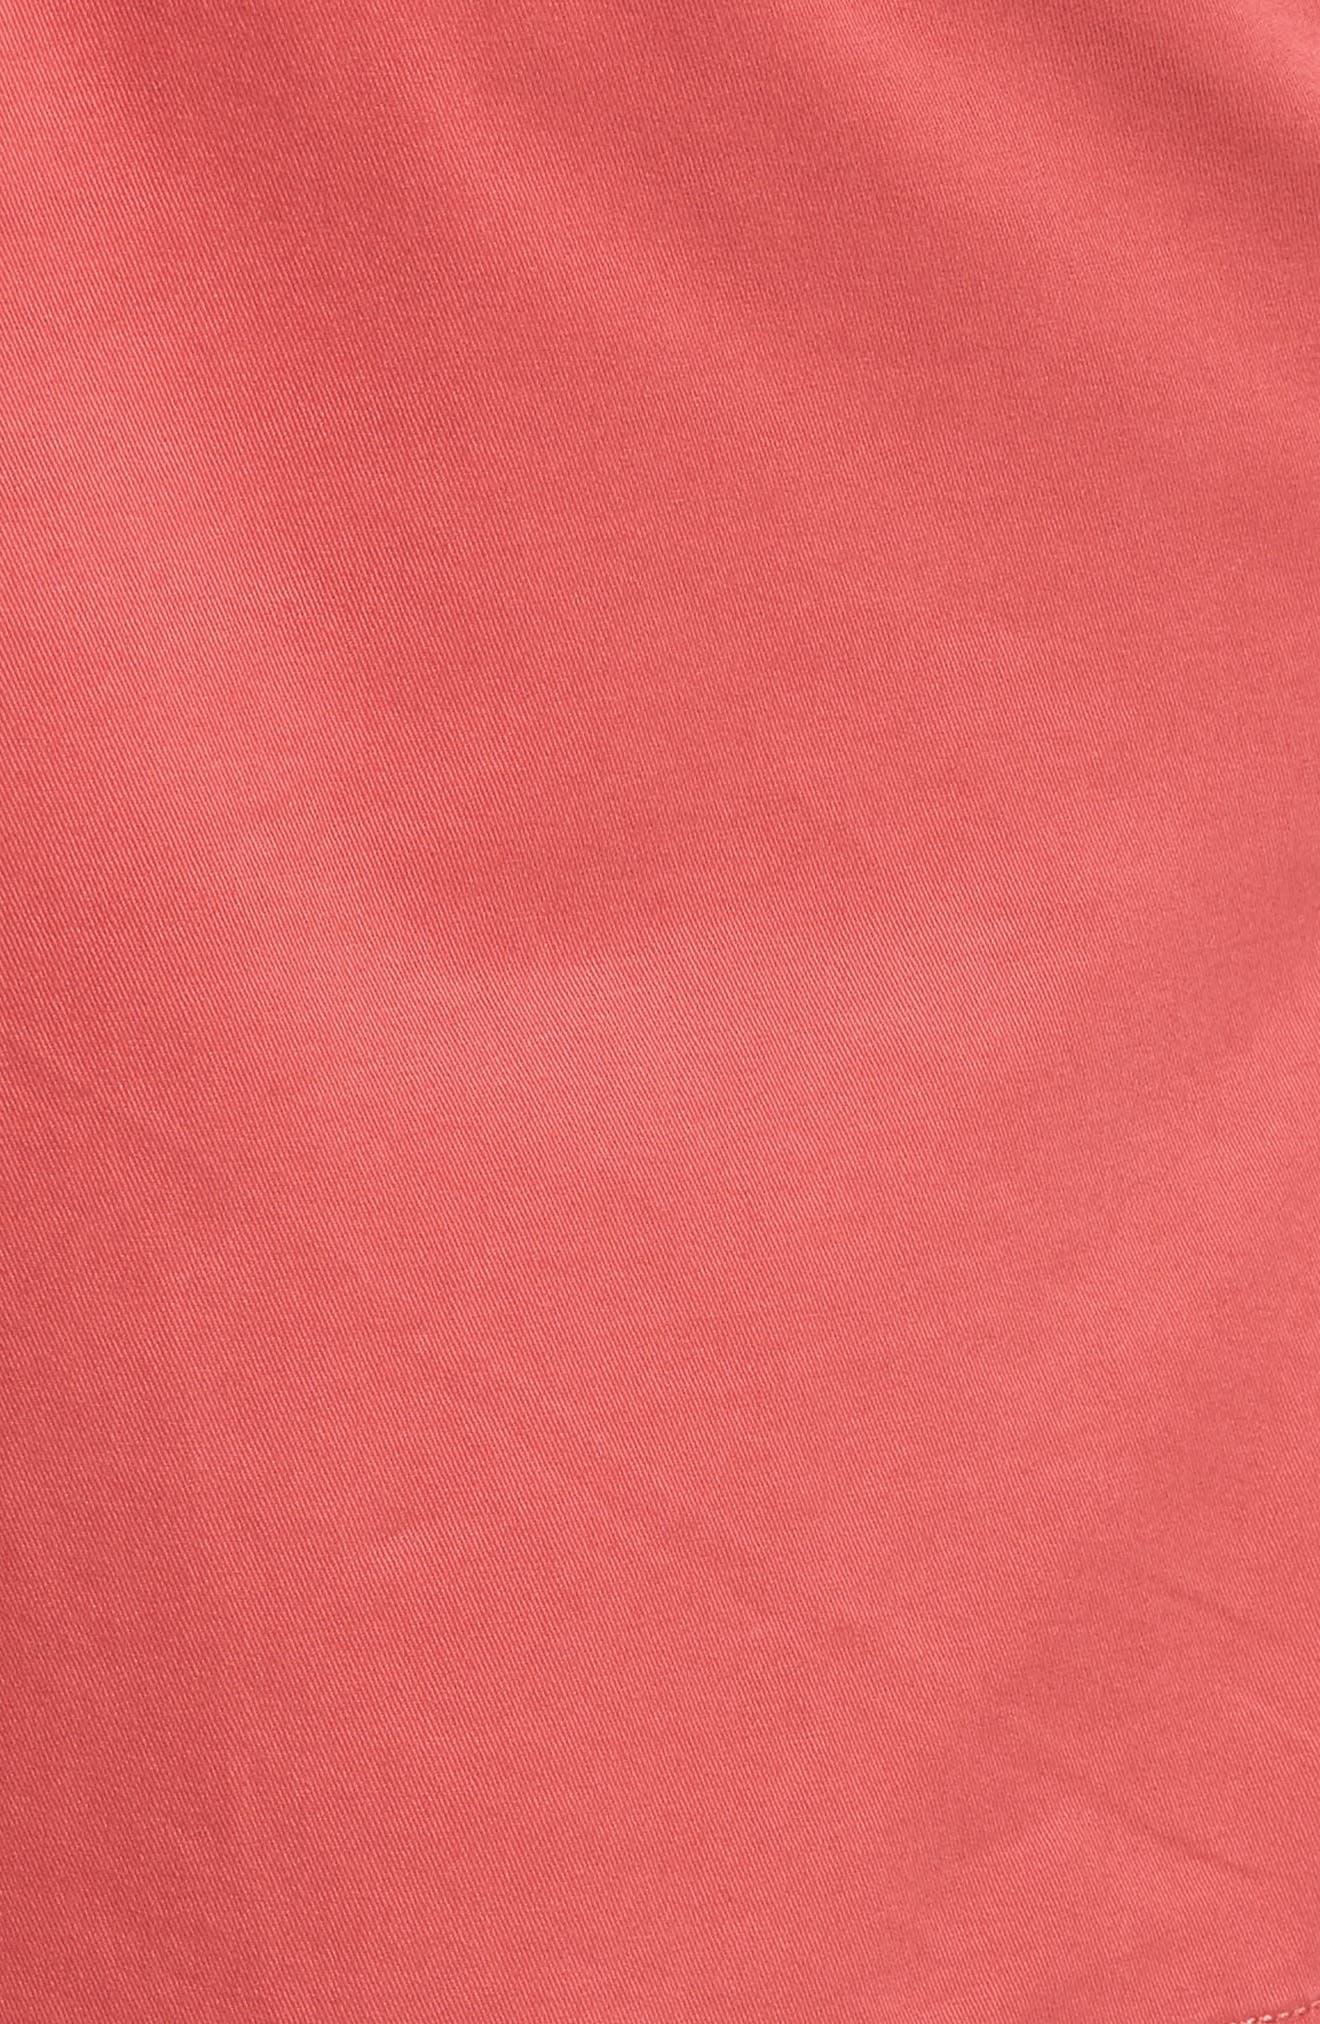 Ballard Slim Fit Stretch Chino 7-Inch Shorts,                             Alternate thumbnail 59, color,